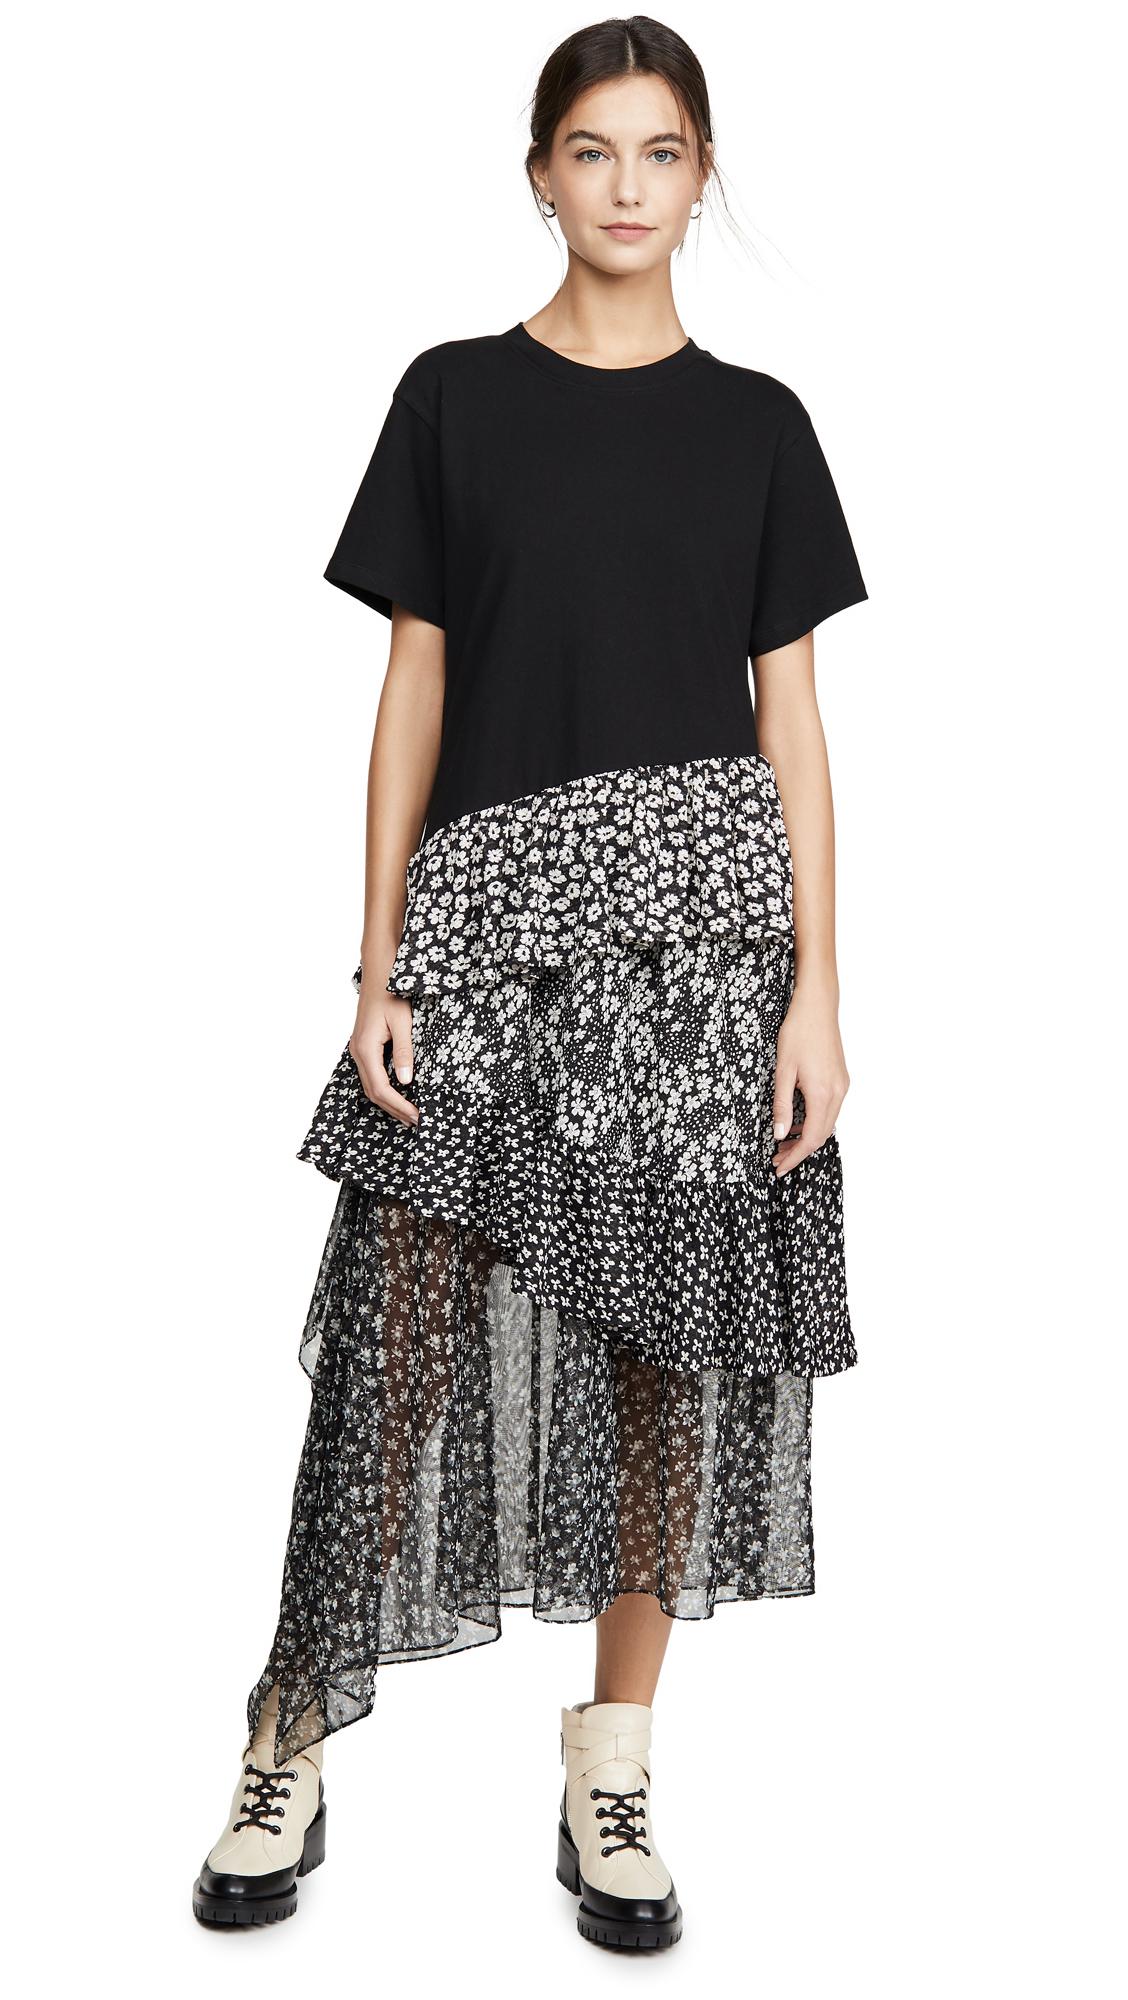 Buy GOEN.J Asymmetric Floral Print Cotton Jersey Top Dress online beautiful GOEN.J Clothing, Dresses